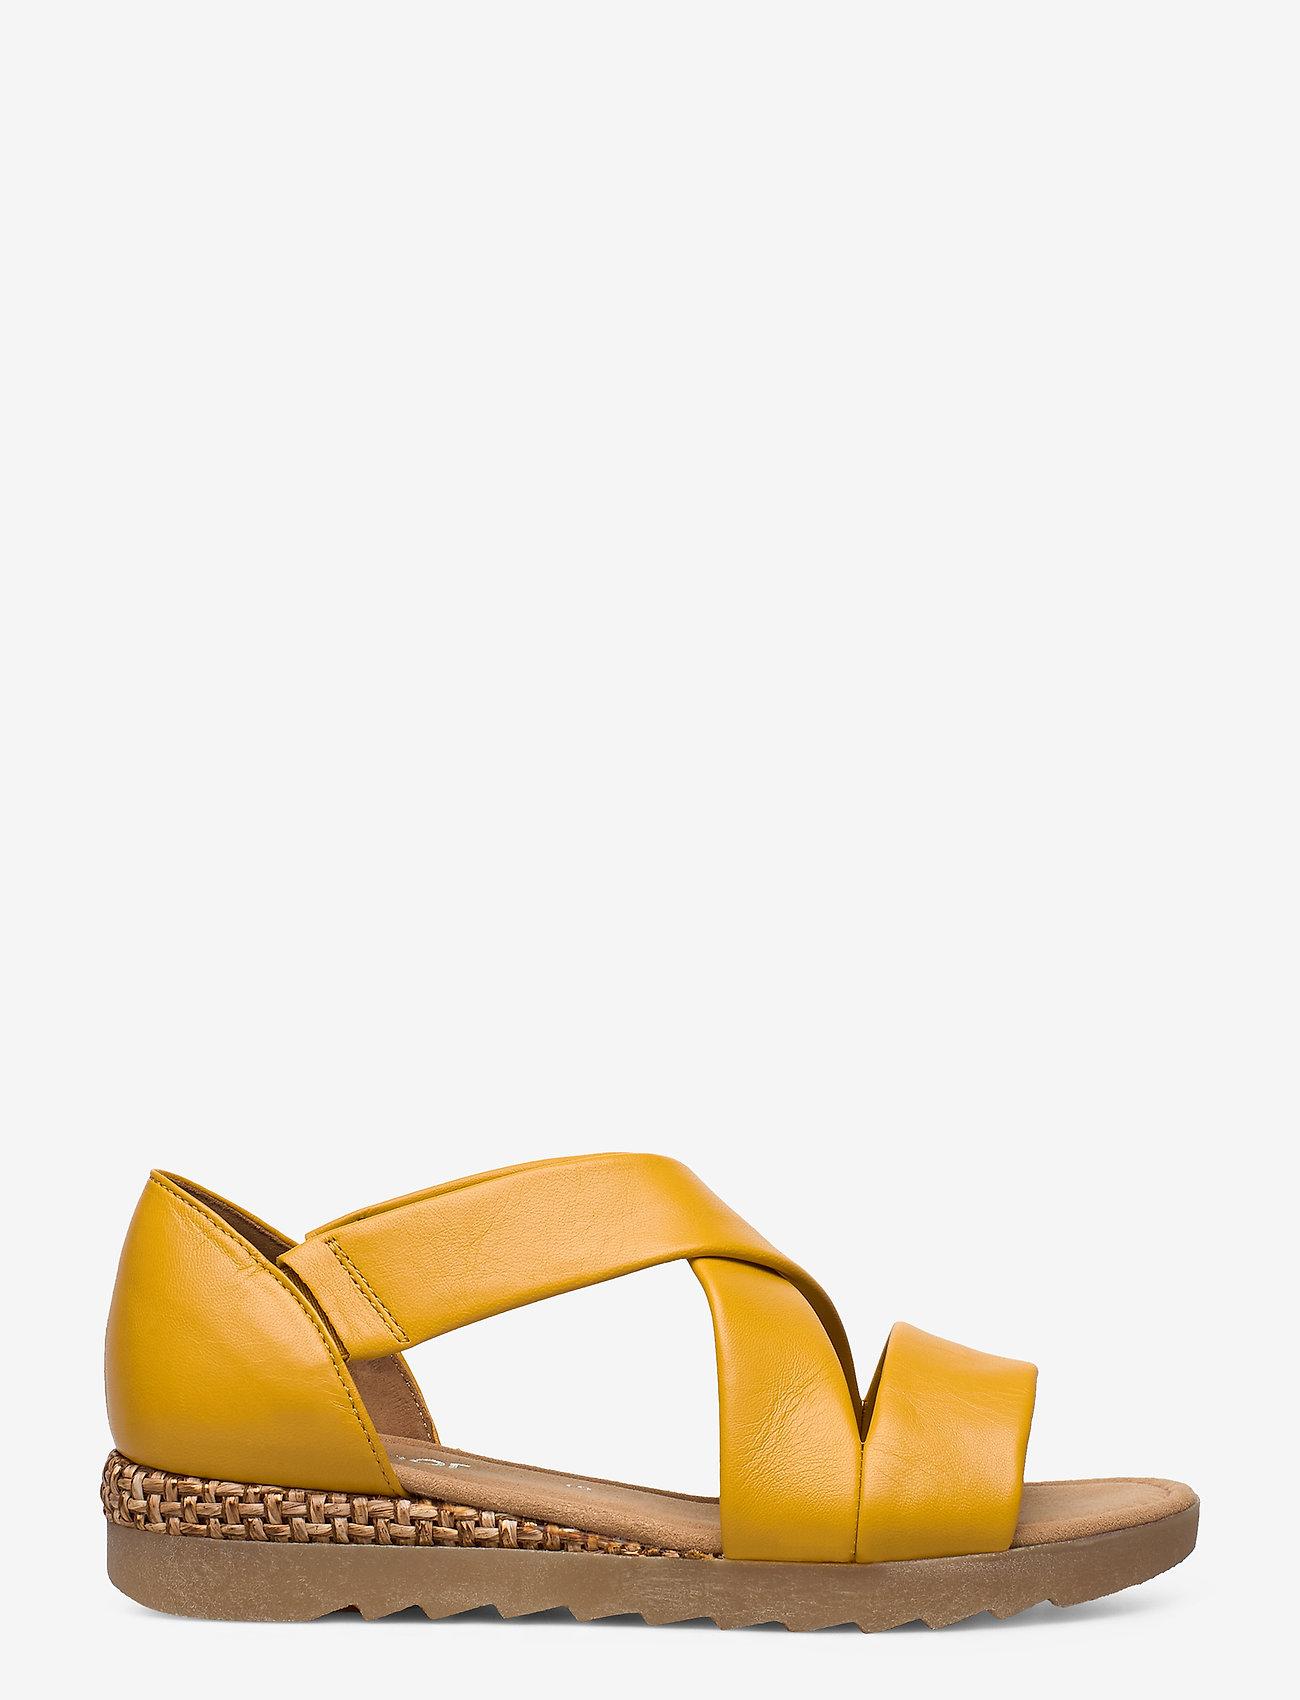 Gabor - sandals - høyhælte sandaler - yellow